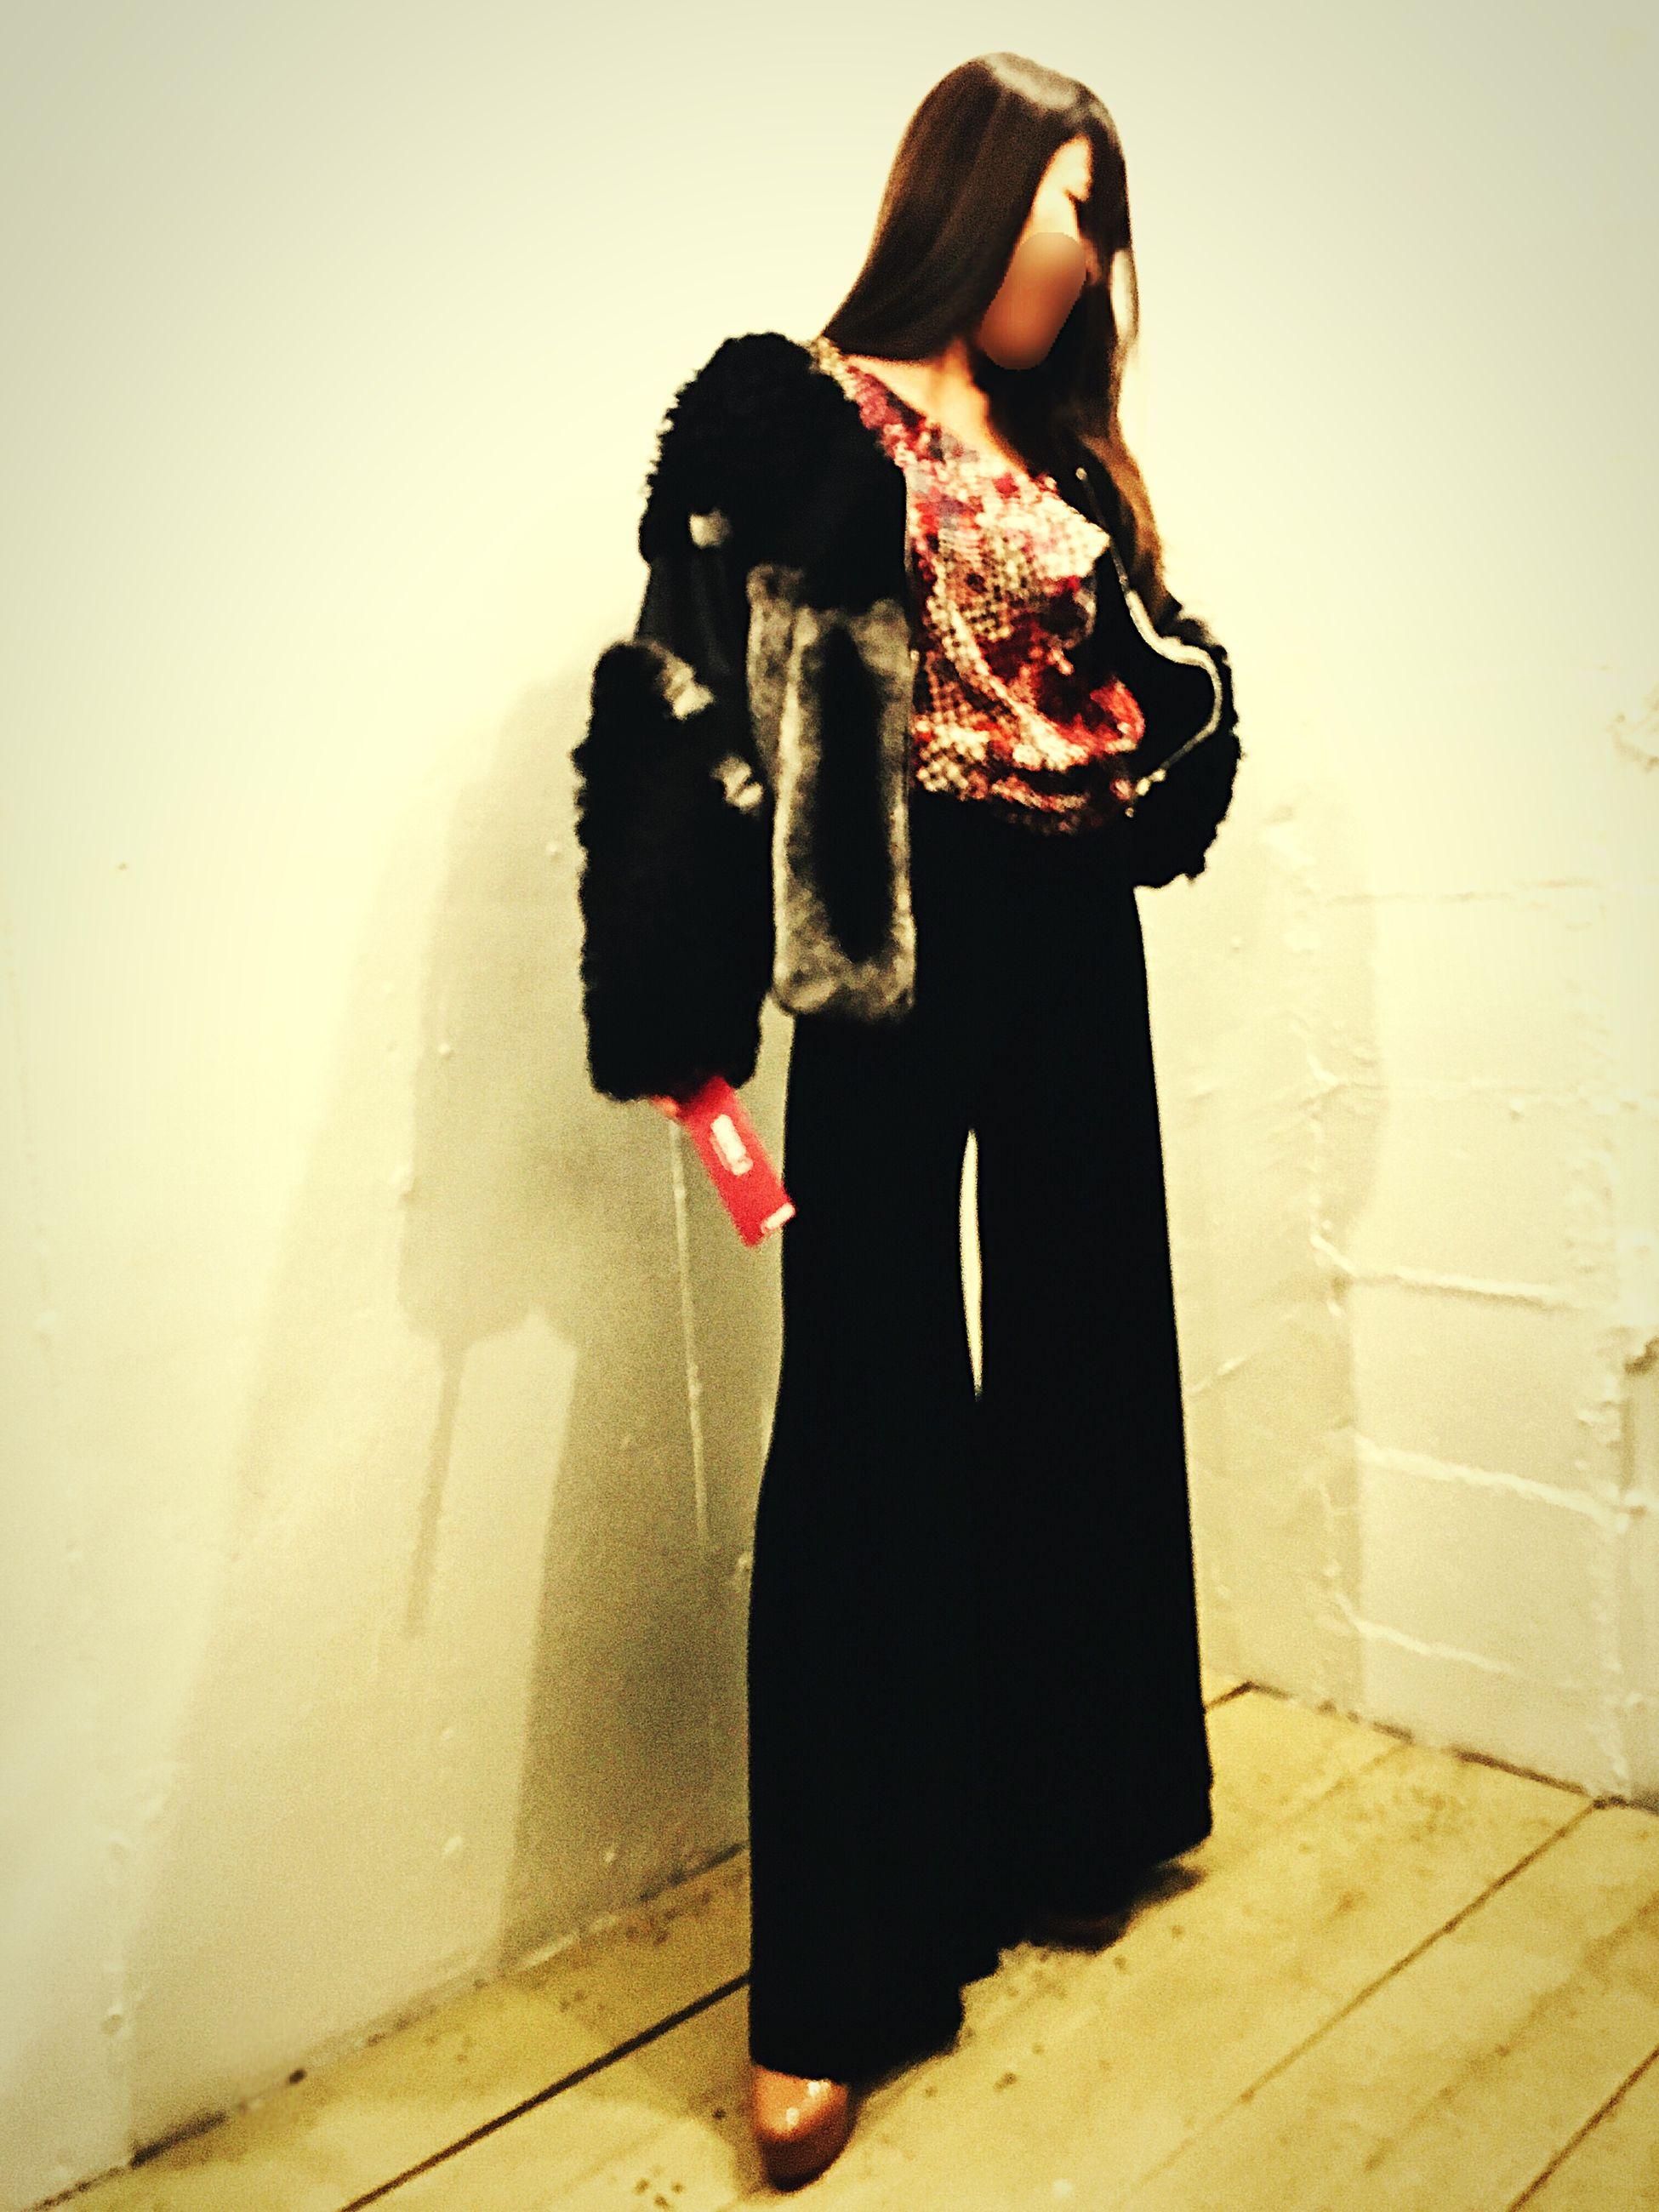 1.20 fri😝ootd✌🏻️in Mucho Mucho Daikanyama brand→ LydiaDelgado tag: Real People Lifestyles Day Fashion Photography Model Fashionmodel  Fashion Ootd Black Mode